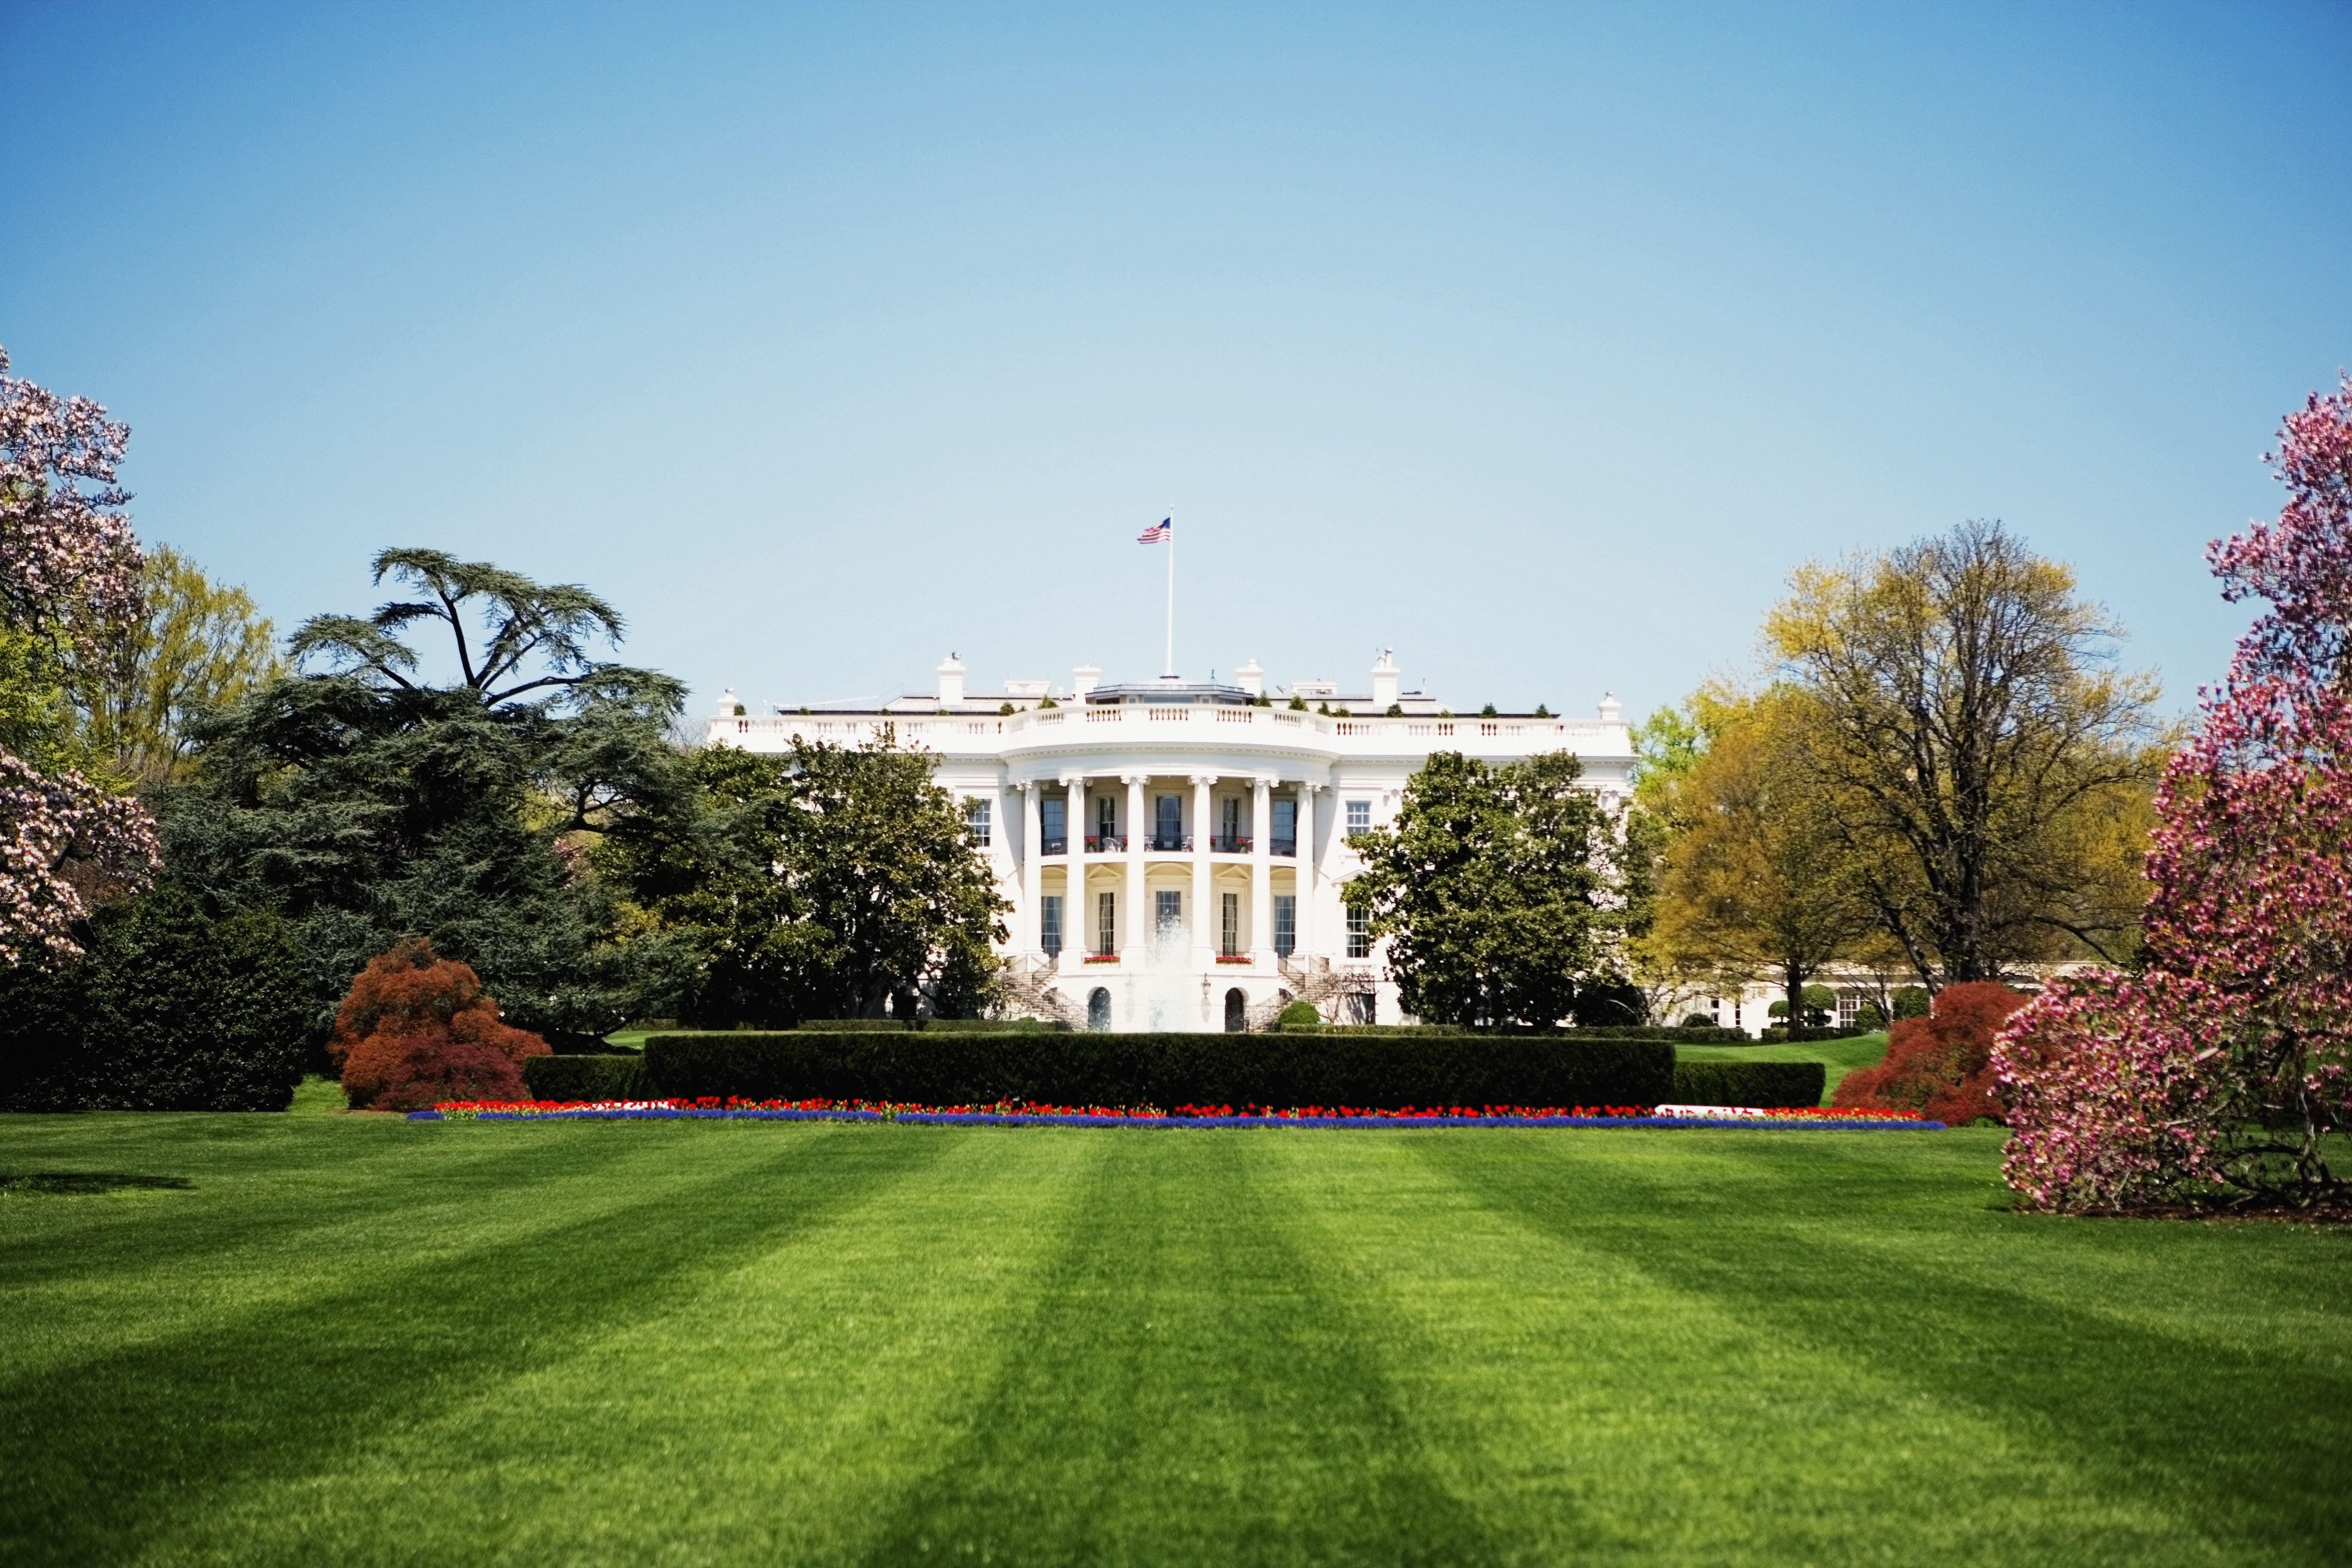 Low angle view of the White House, Washington DC, USA